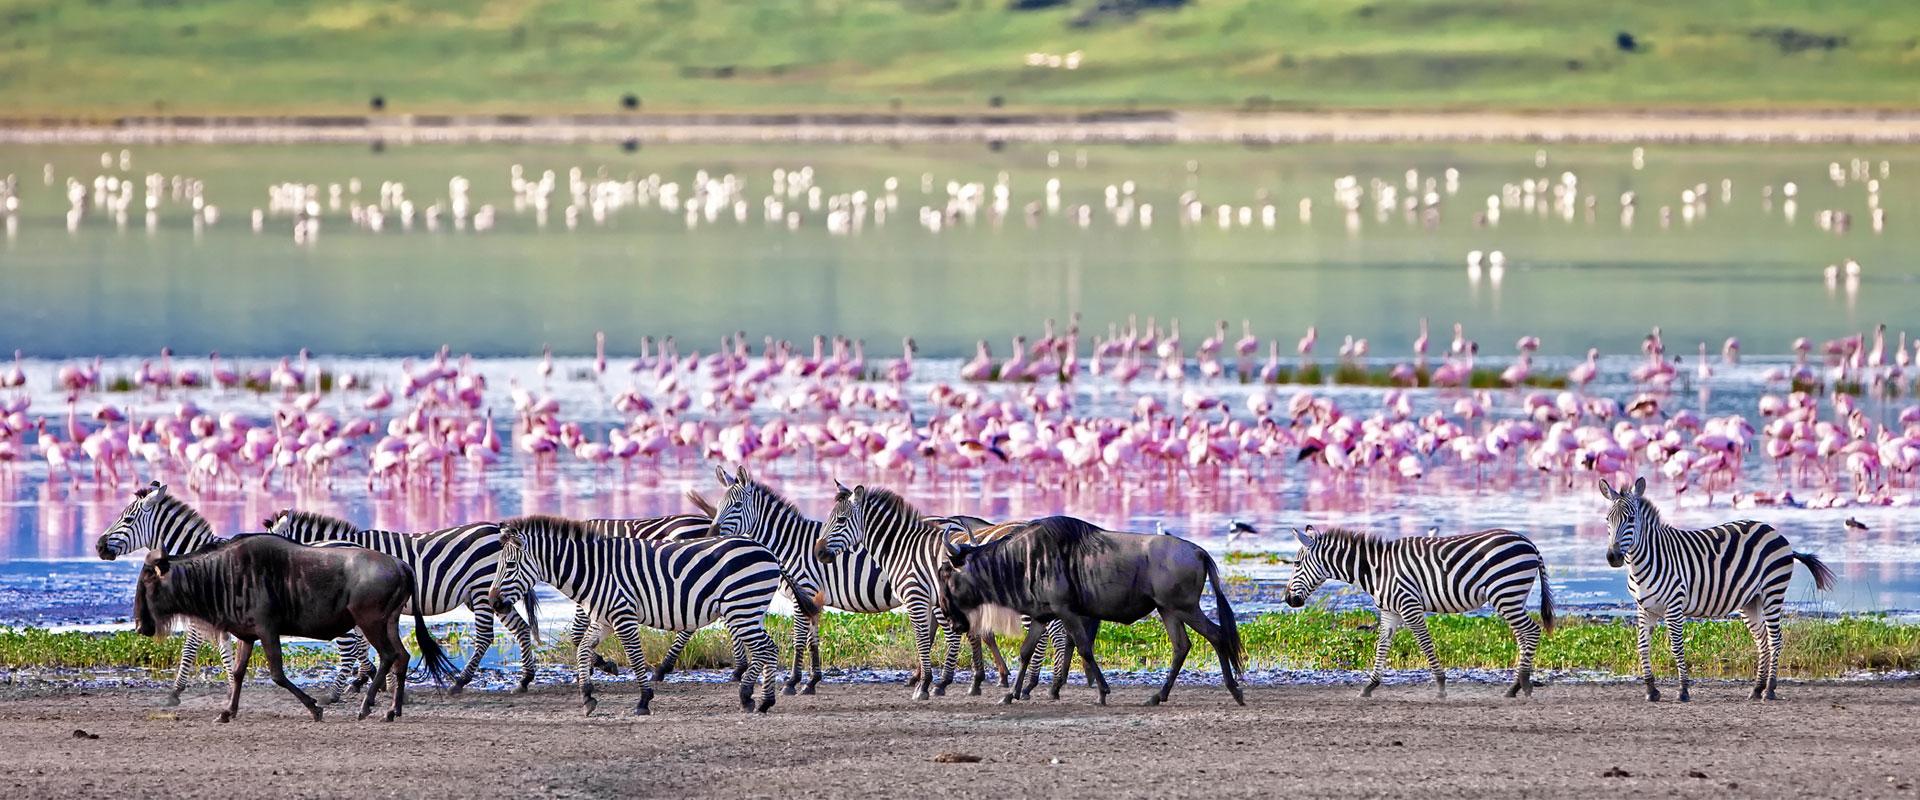 tanzania-destinations-fullwidth